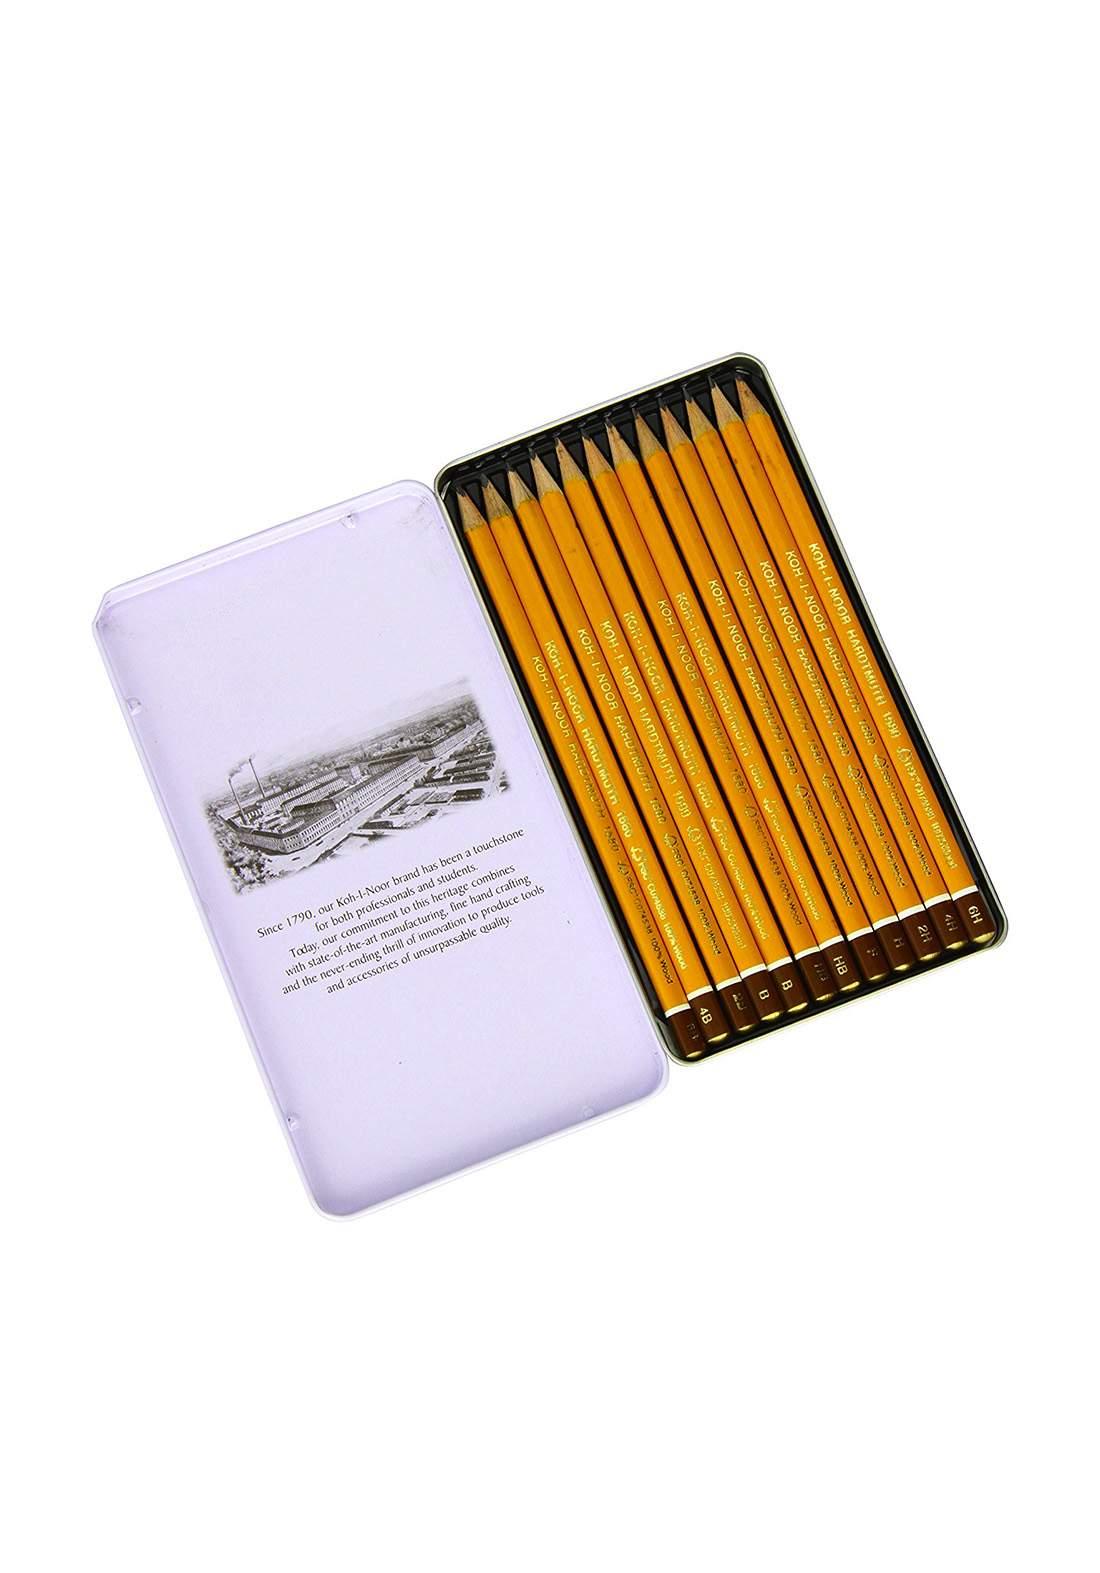 Koh-I-Noor Set Of Graphite Pencils 12 سيت أقلام رصاص كرافيت 12 قلم